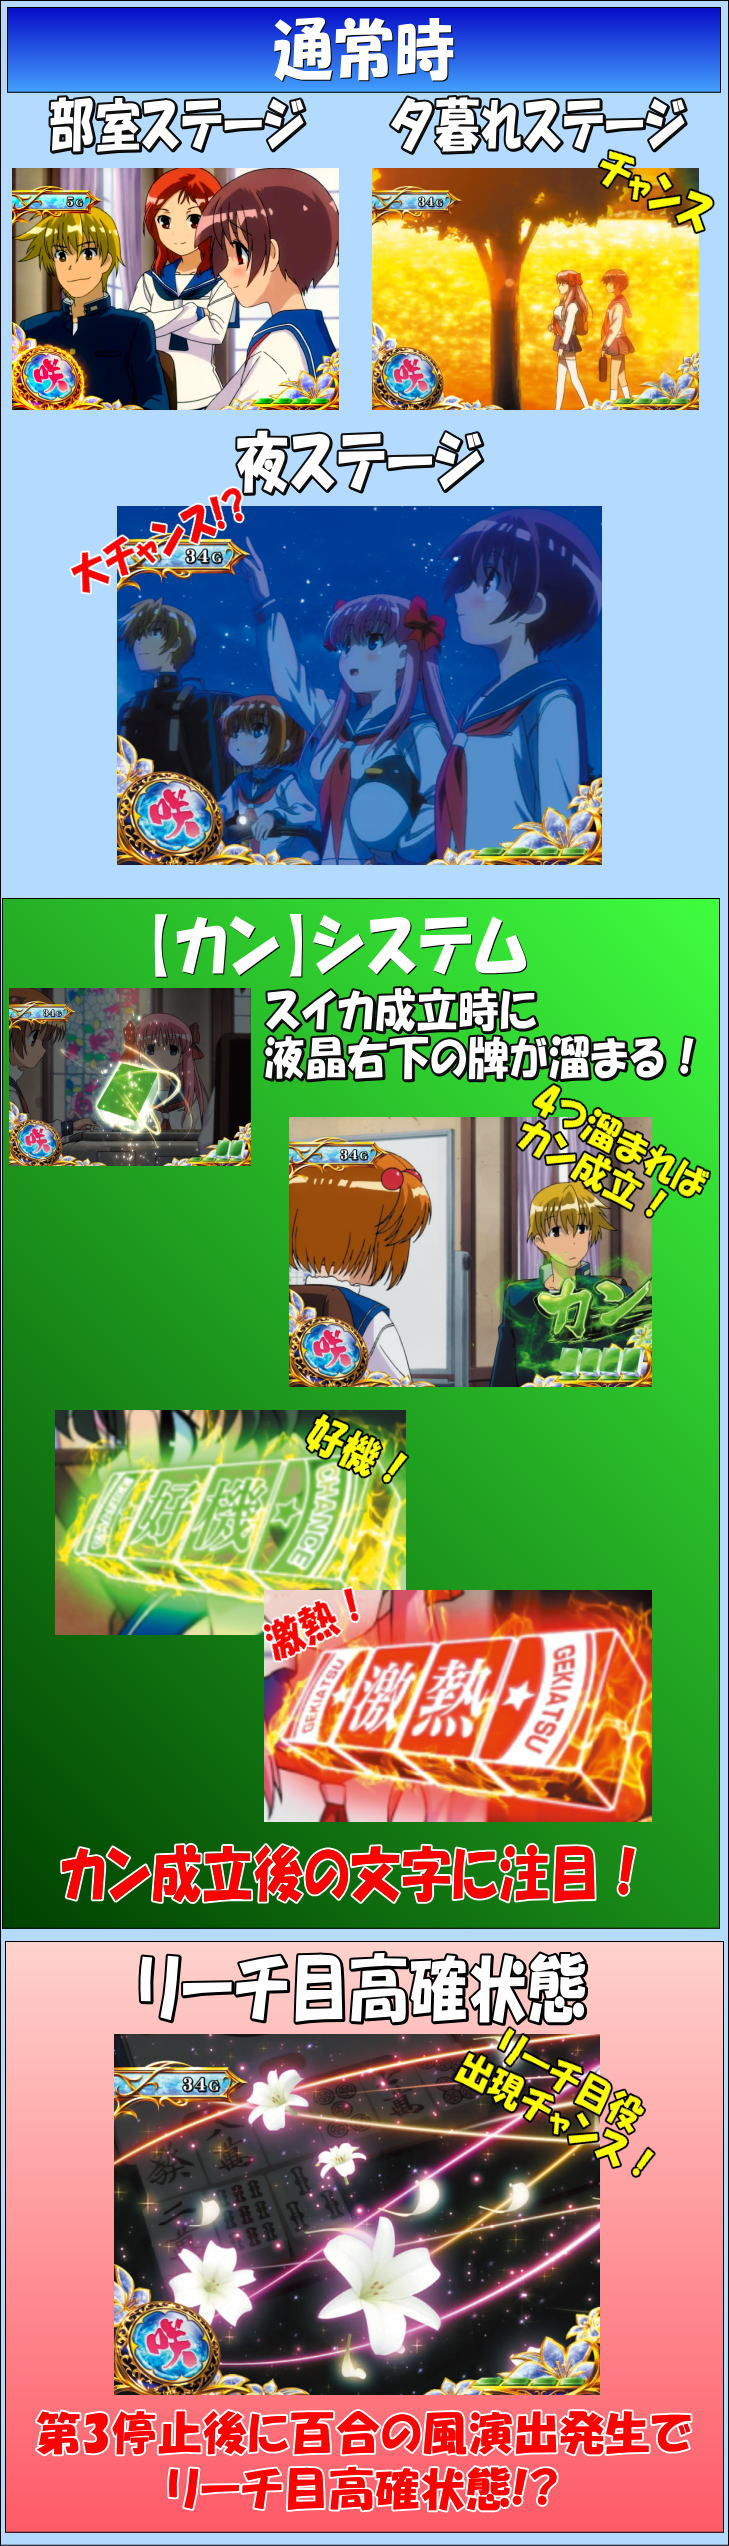 SANYO(三洋物産)のゲームフロー